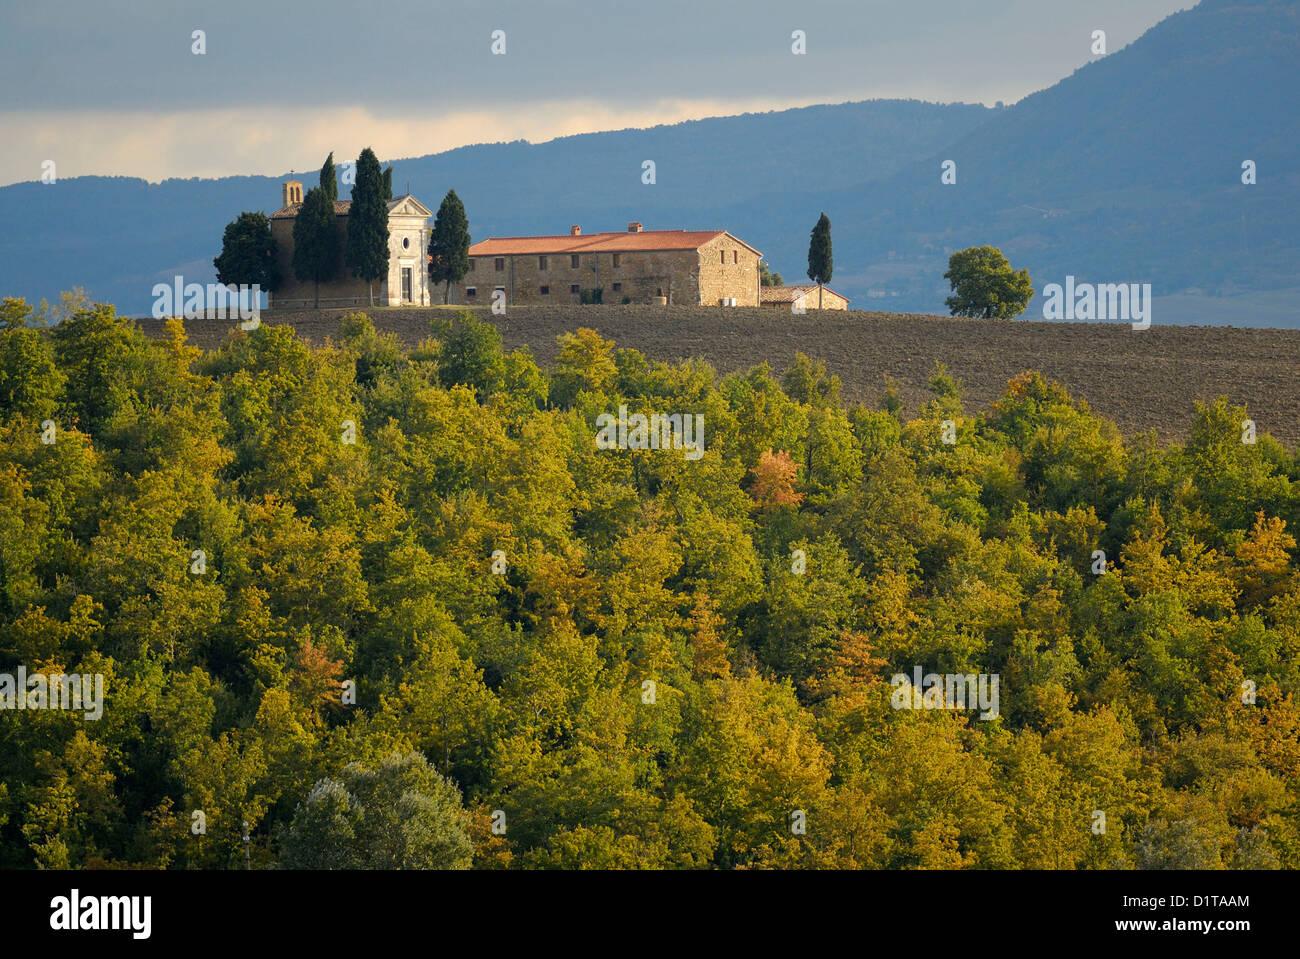 Vitaleta pequeña iglesia de San Quirico d'Orcia Val d'Orcia, paisajes, Siena, Toscana, Italia Imagen De Stock